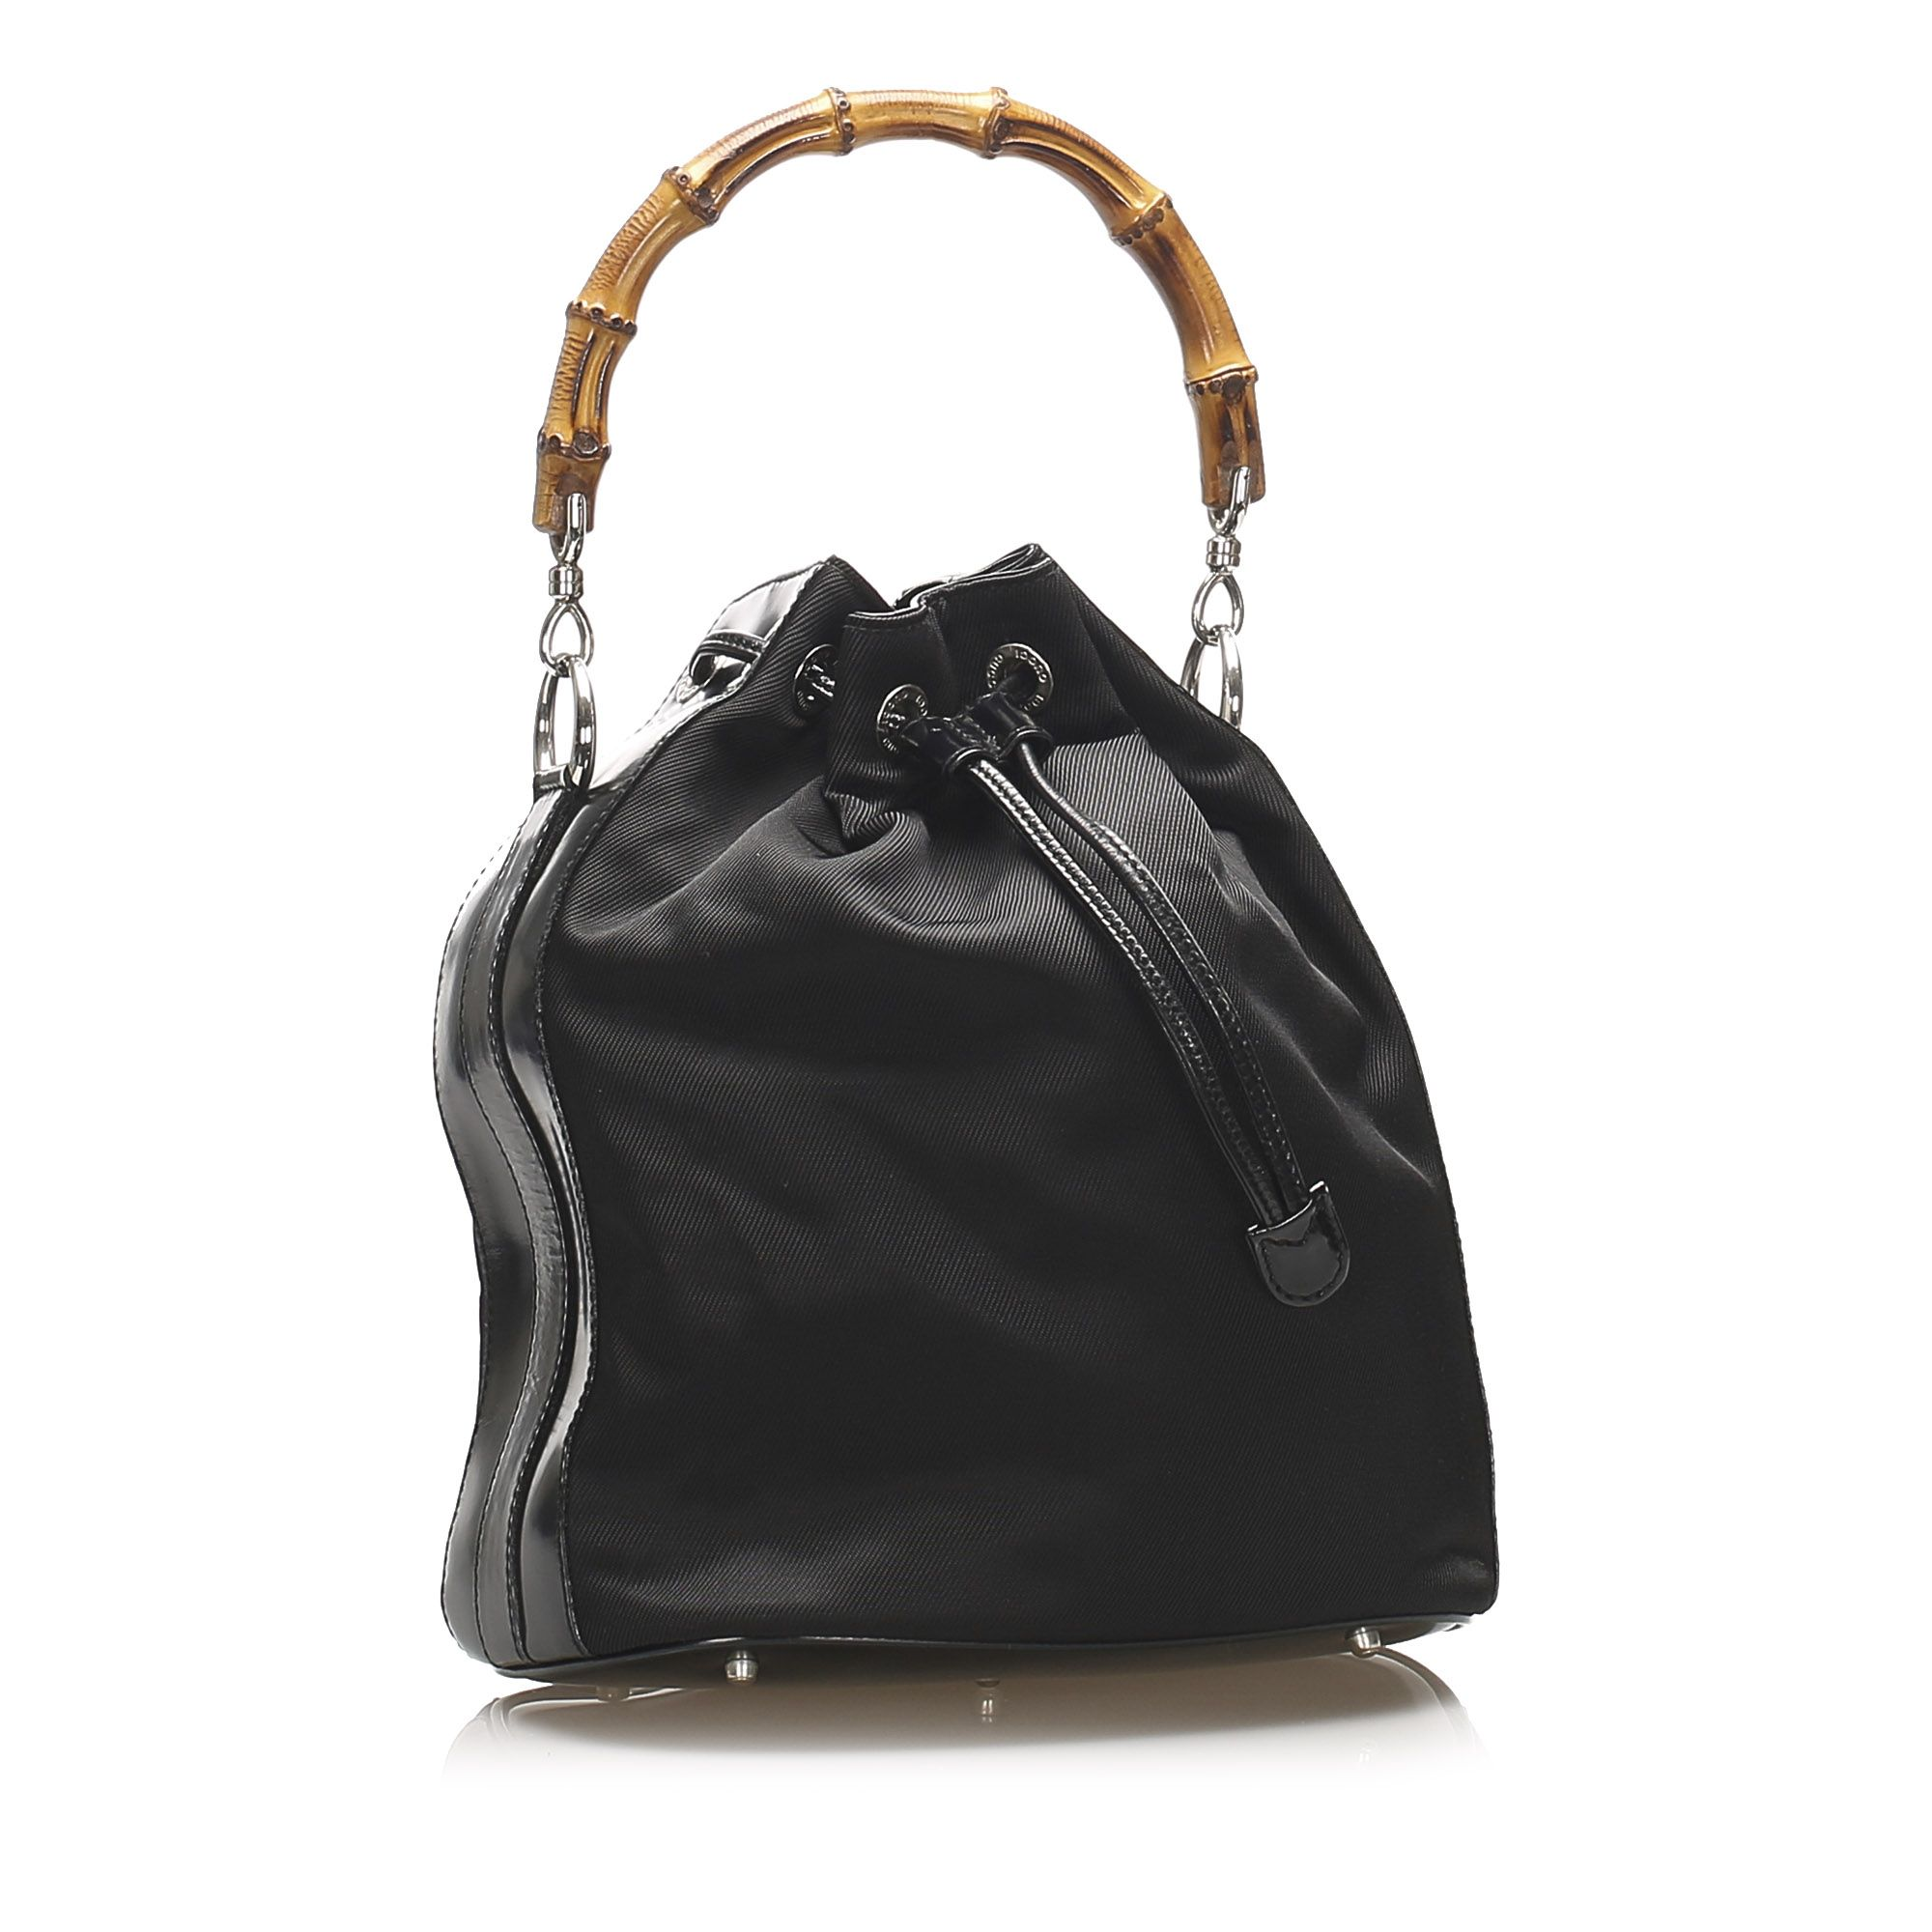 Vintage Gucci Bamboo Canvas Bucket Bag Black